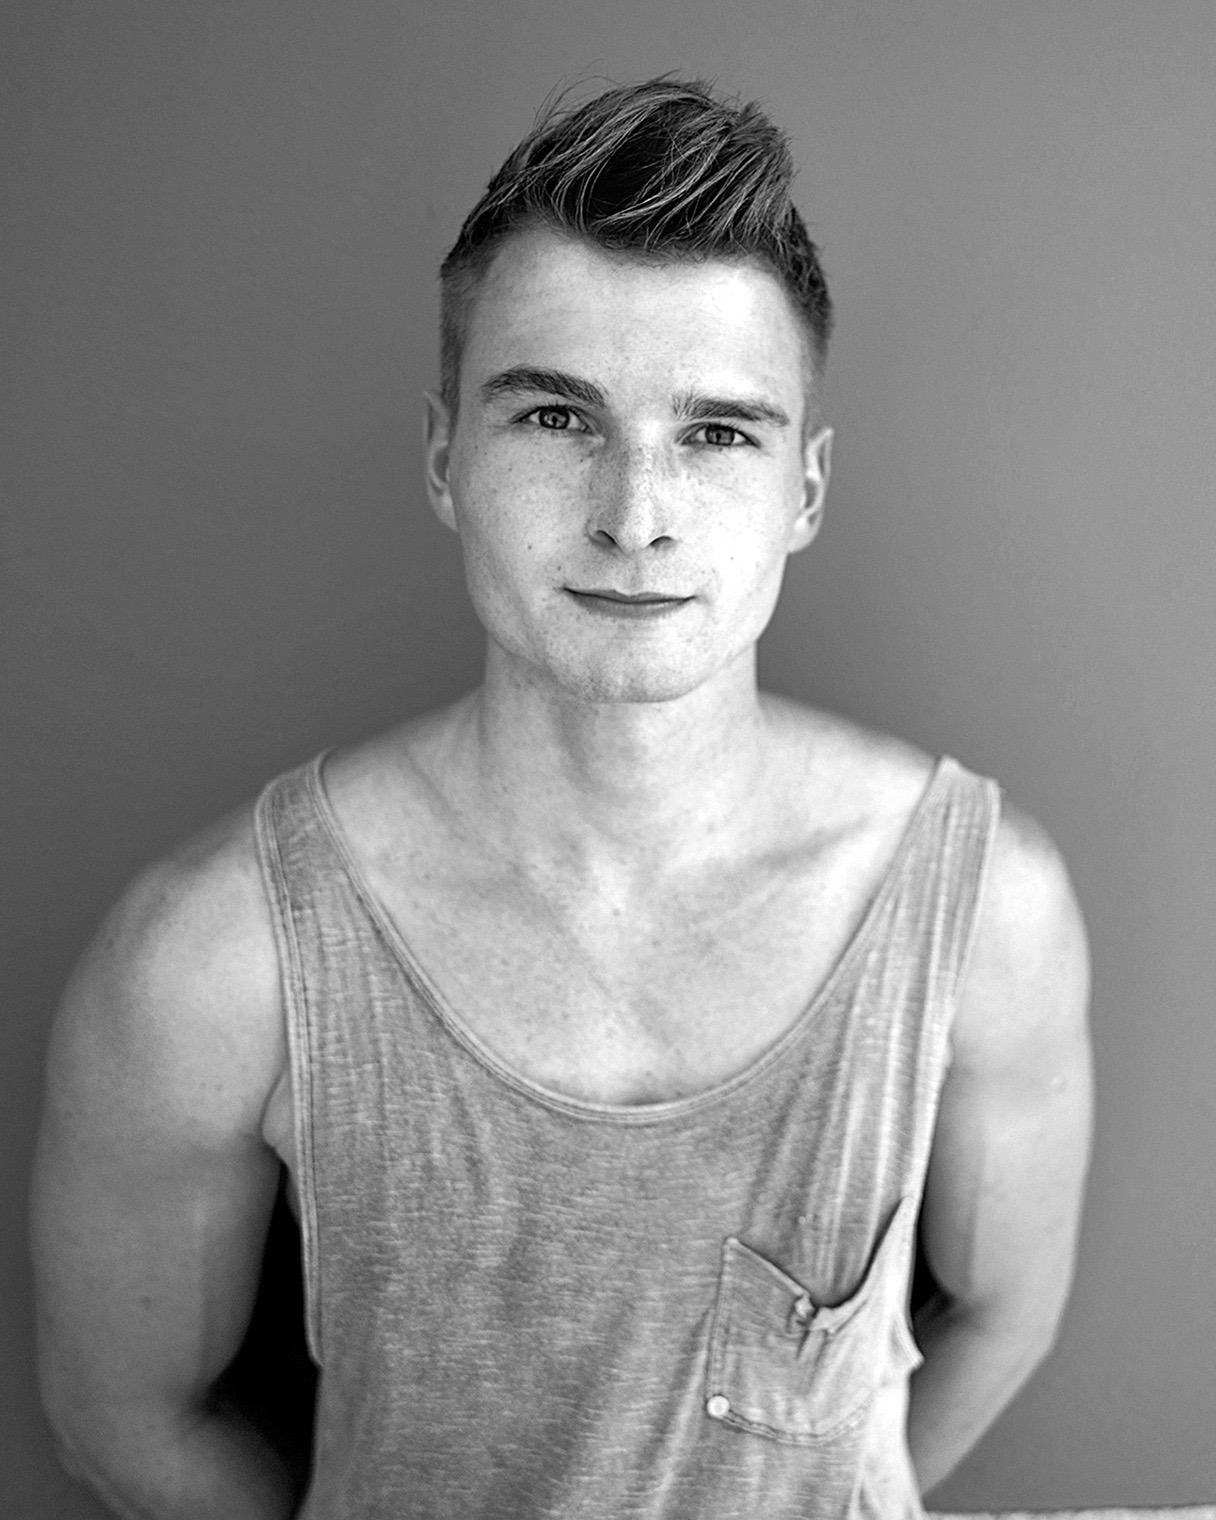 Portrait of Brian Rauschert